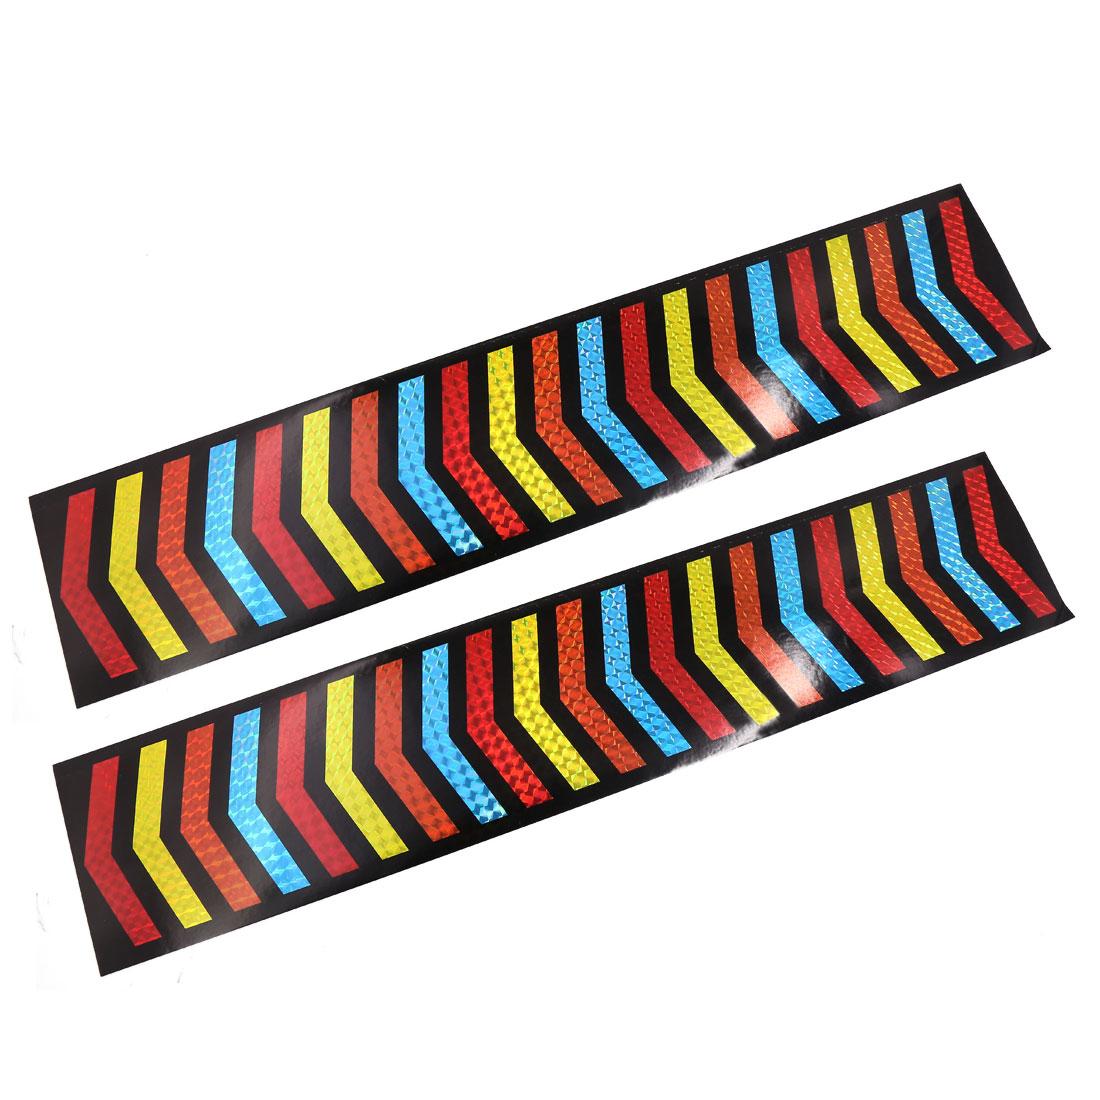 Automobile Car Body Safety Reflective Strips Tape Decal Sticker 49cmx10cm 2 Pcs